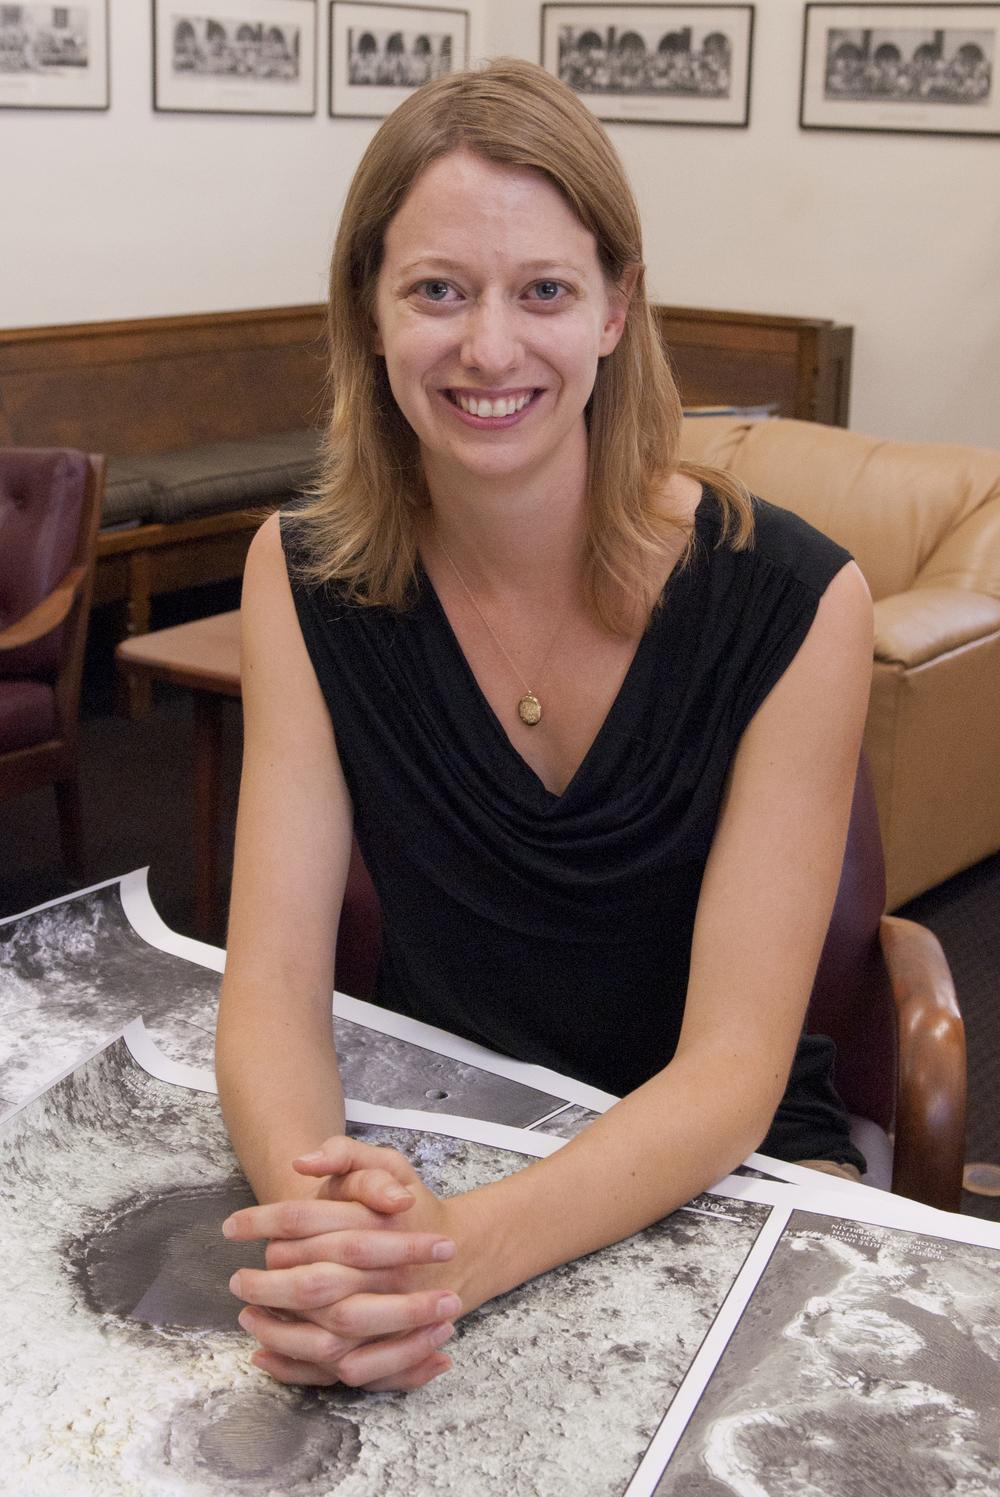 Bethany L. Ehlmann (Missouri & Keble/Hertford 2004)